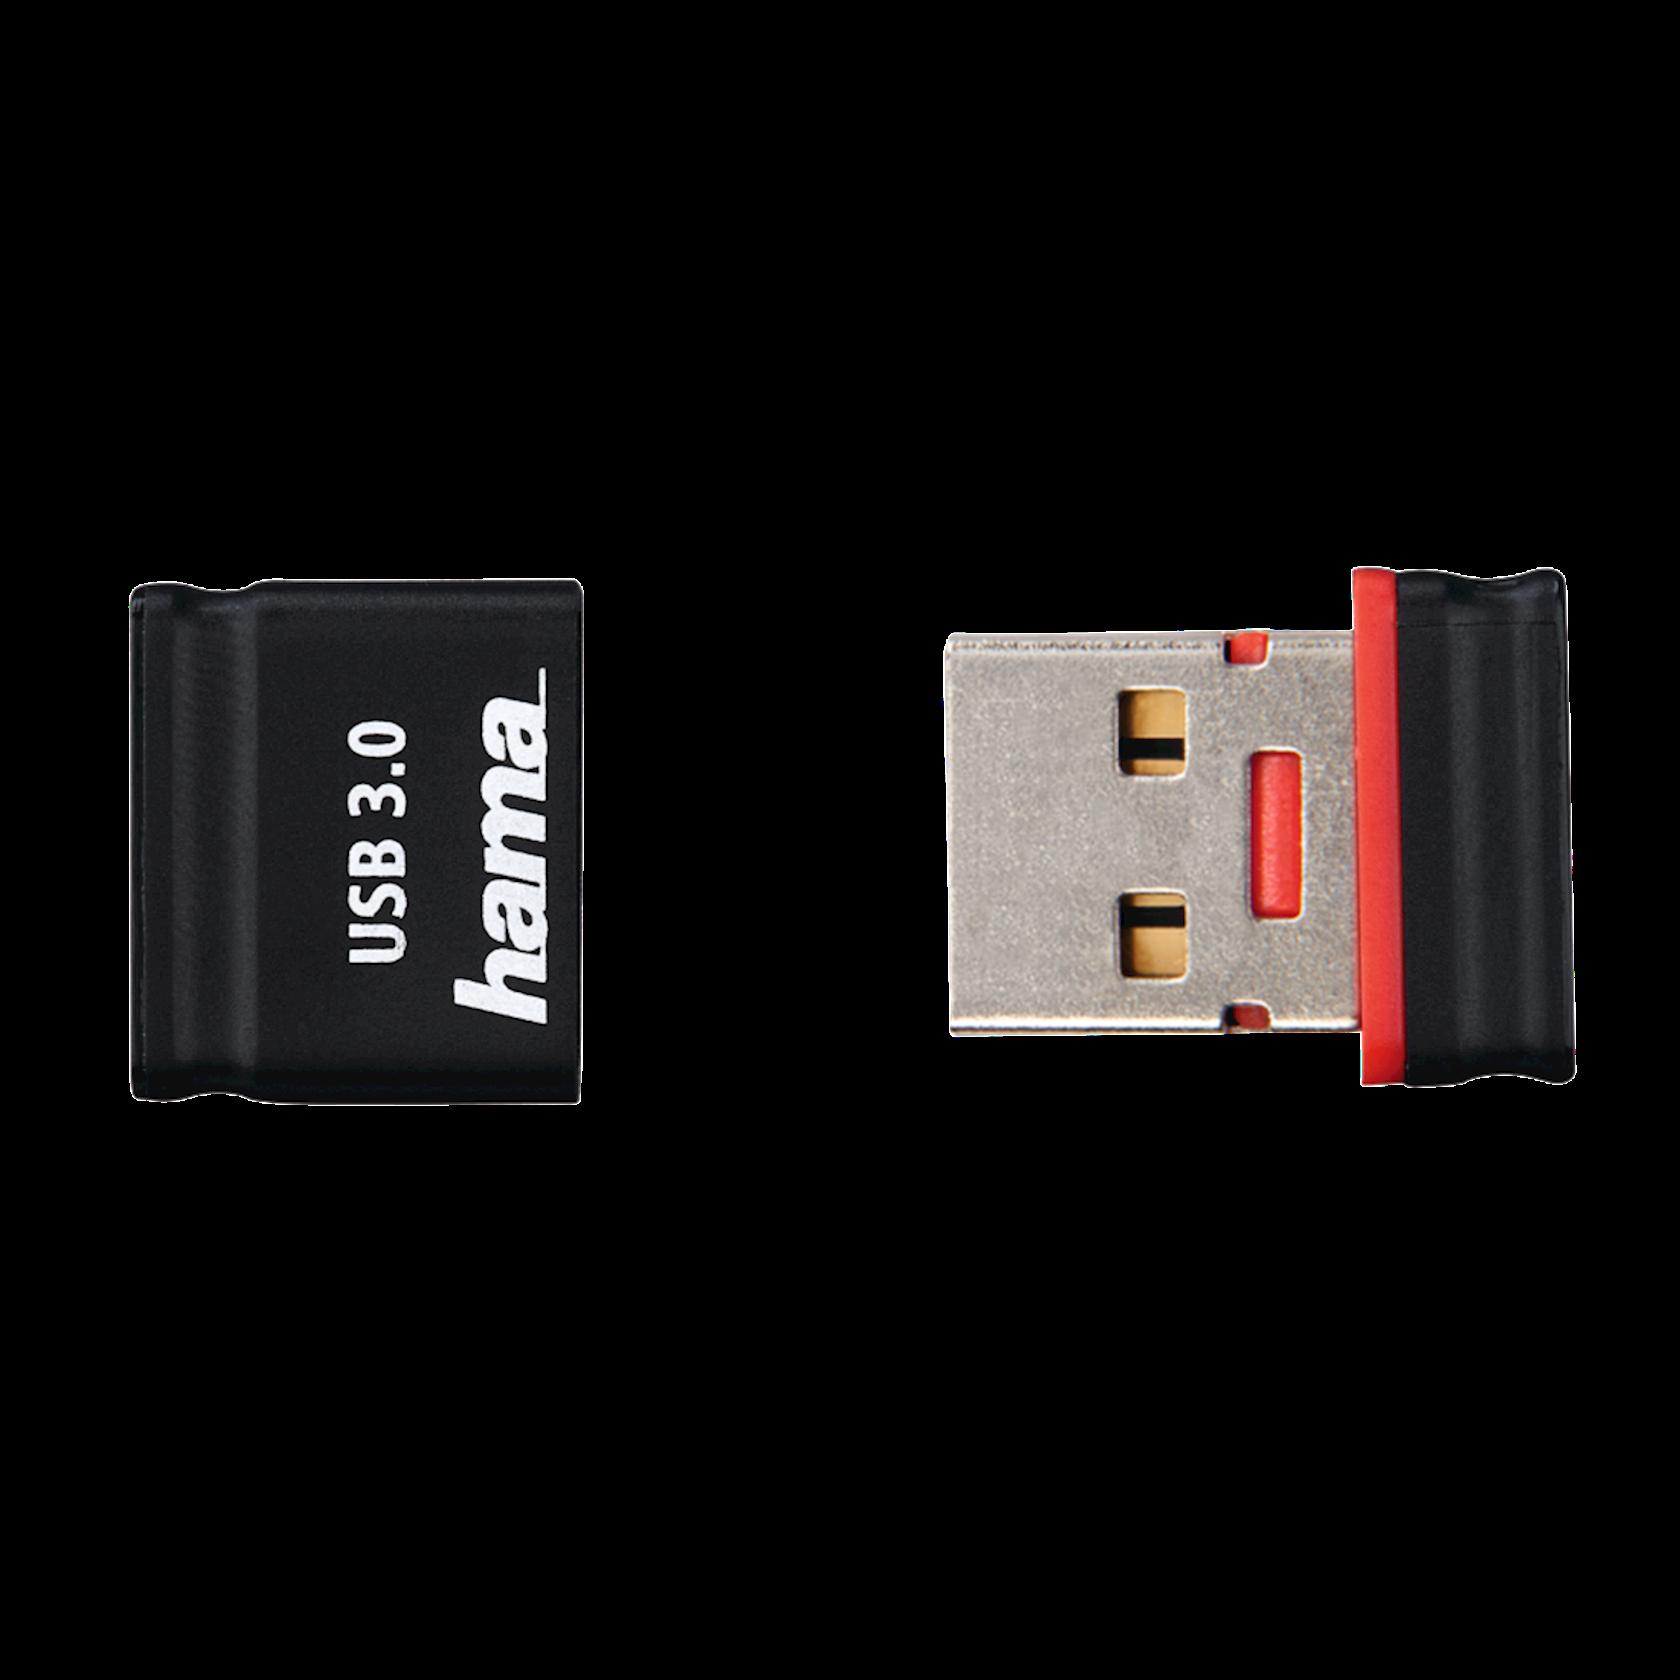 USB-Fleş kart Hama Smartly 32 Gb Usb 3.0